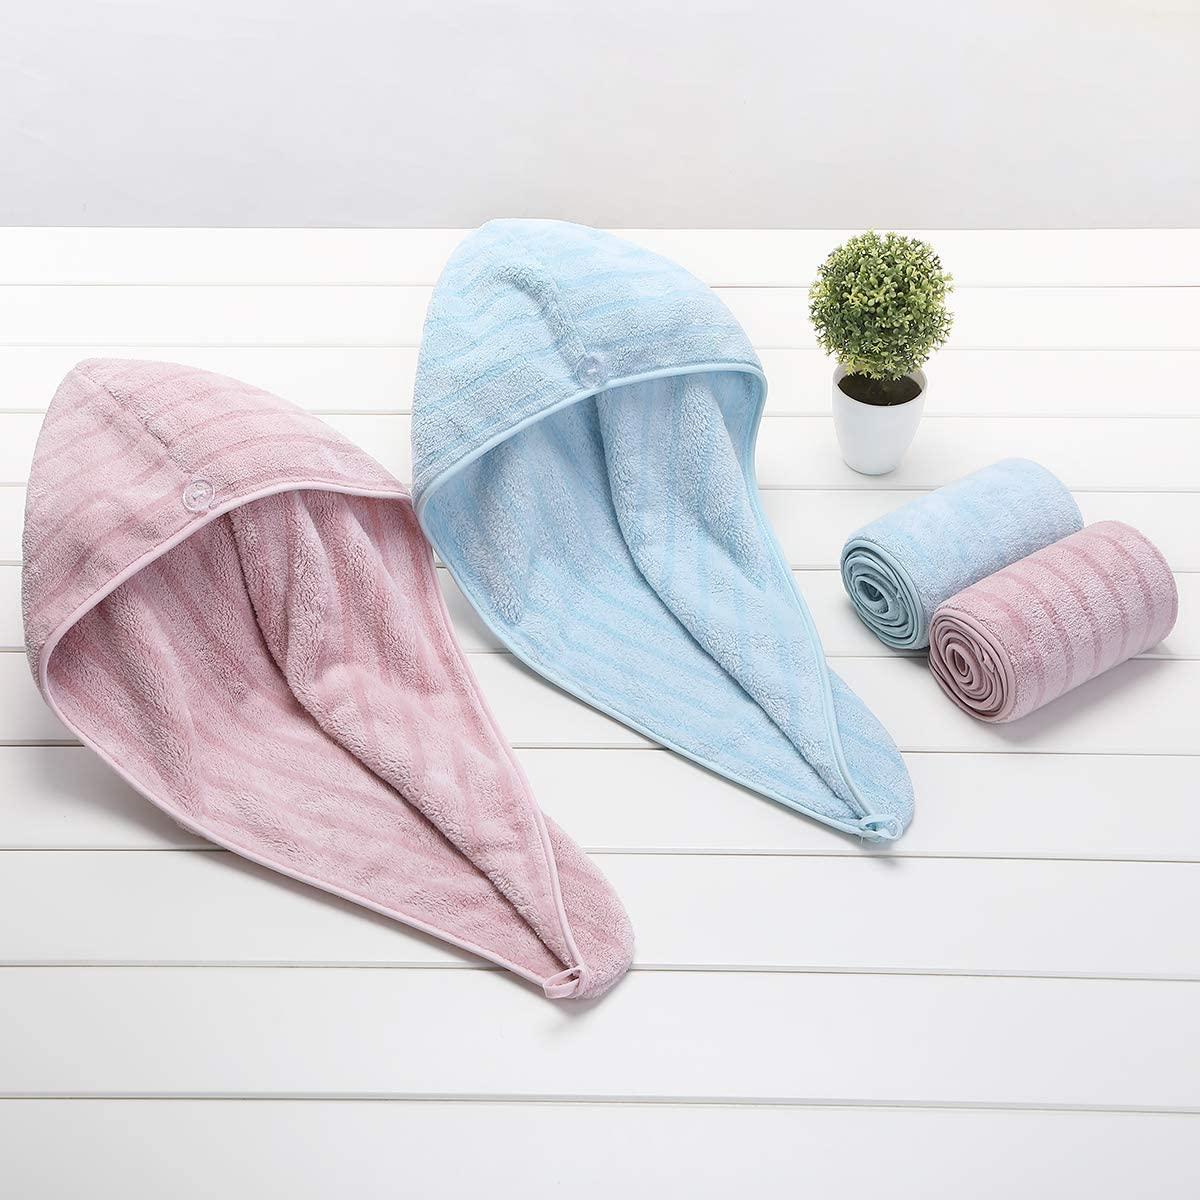 CHARS 2 Pack Microfiber Hair Towels